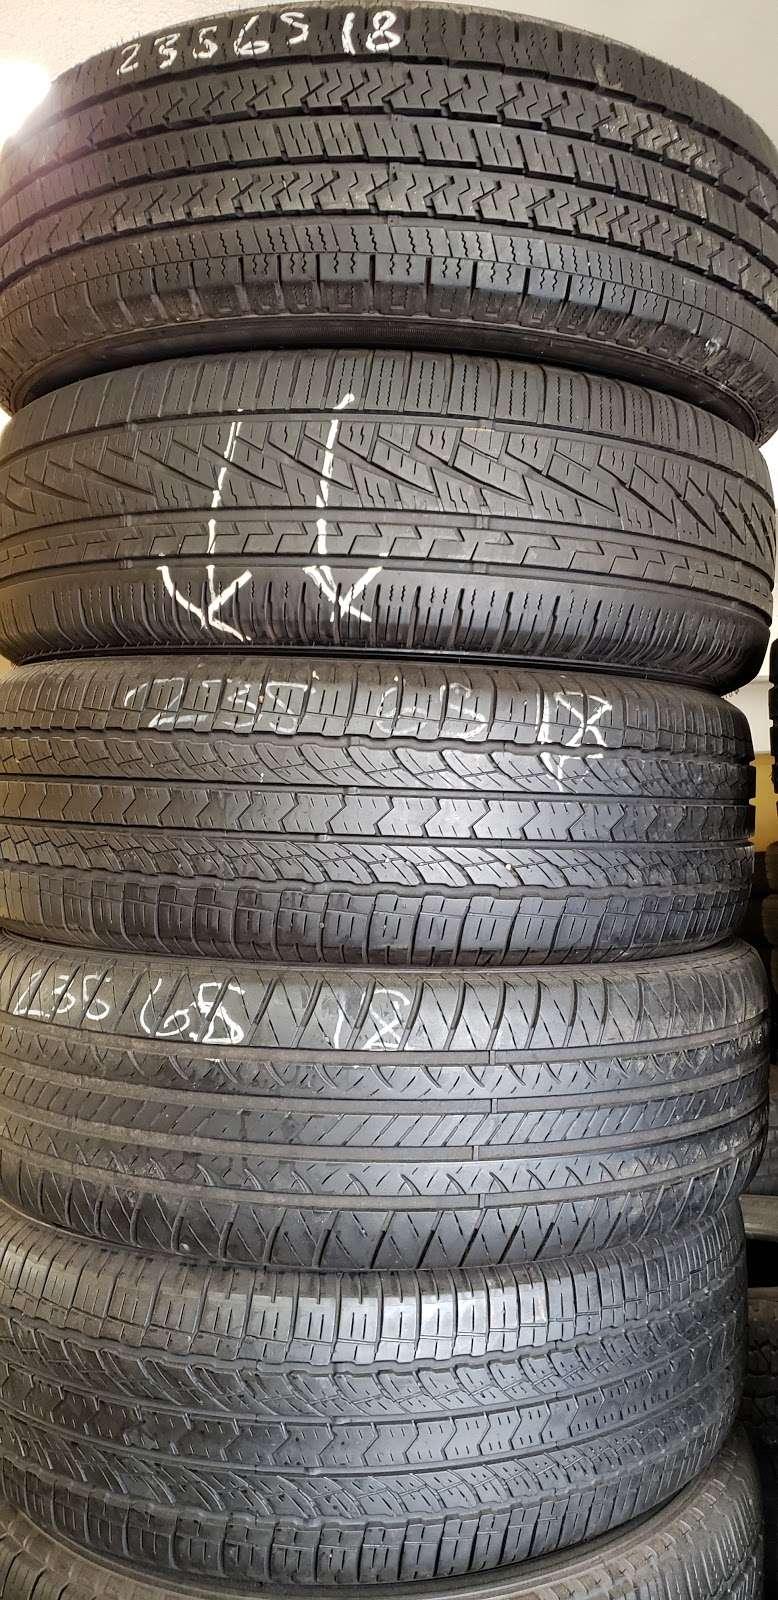 Sierra's Tire Shop - car repair  | Photo 9 of 10 | Address: 8105 Bayway Dr, Baytown, TX 77520, USA | Phone: (346) 265-1754